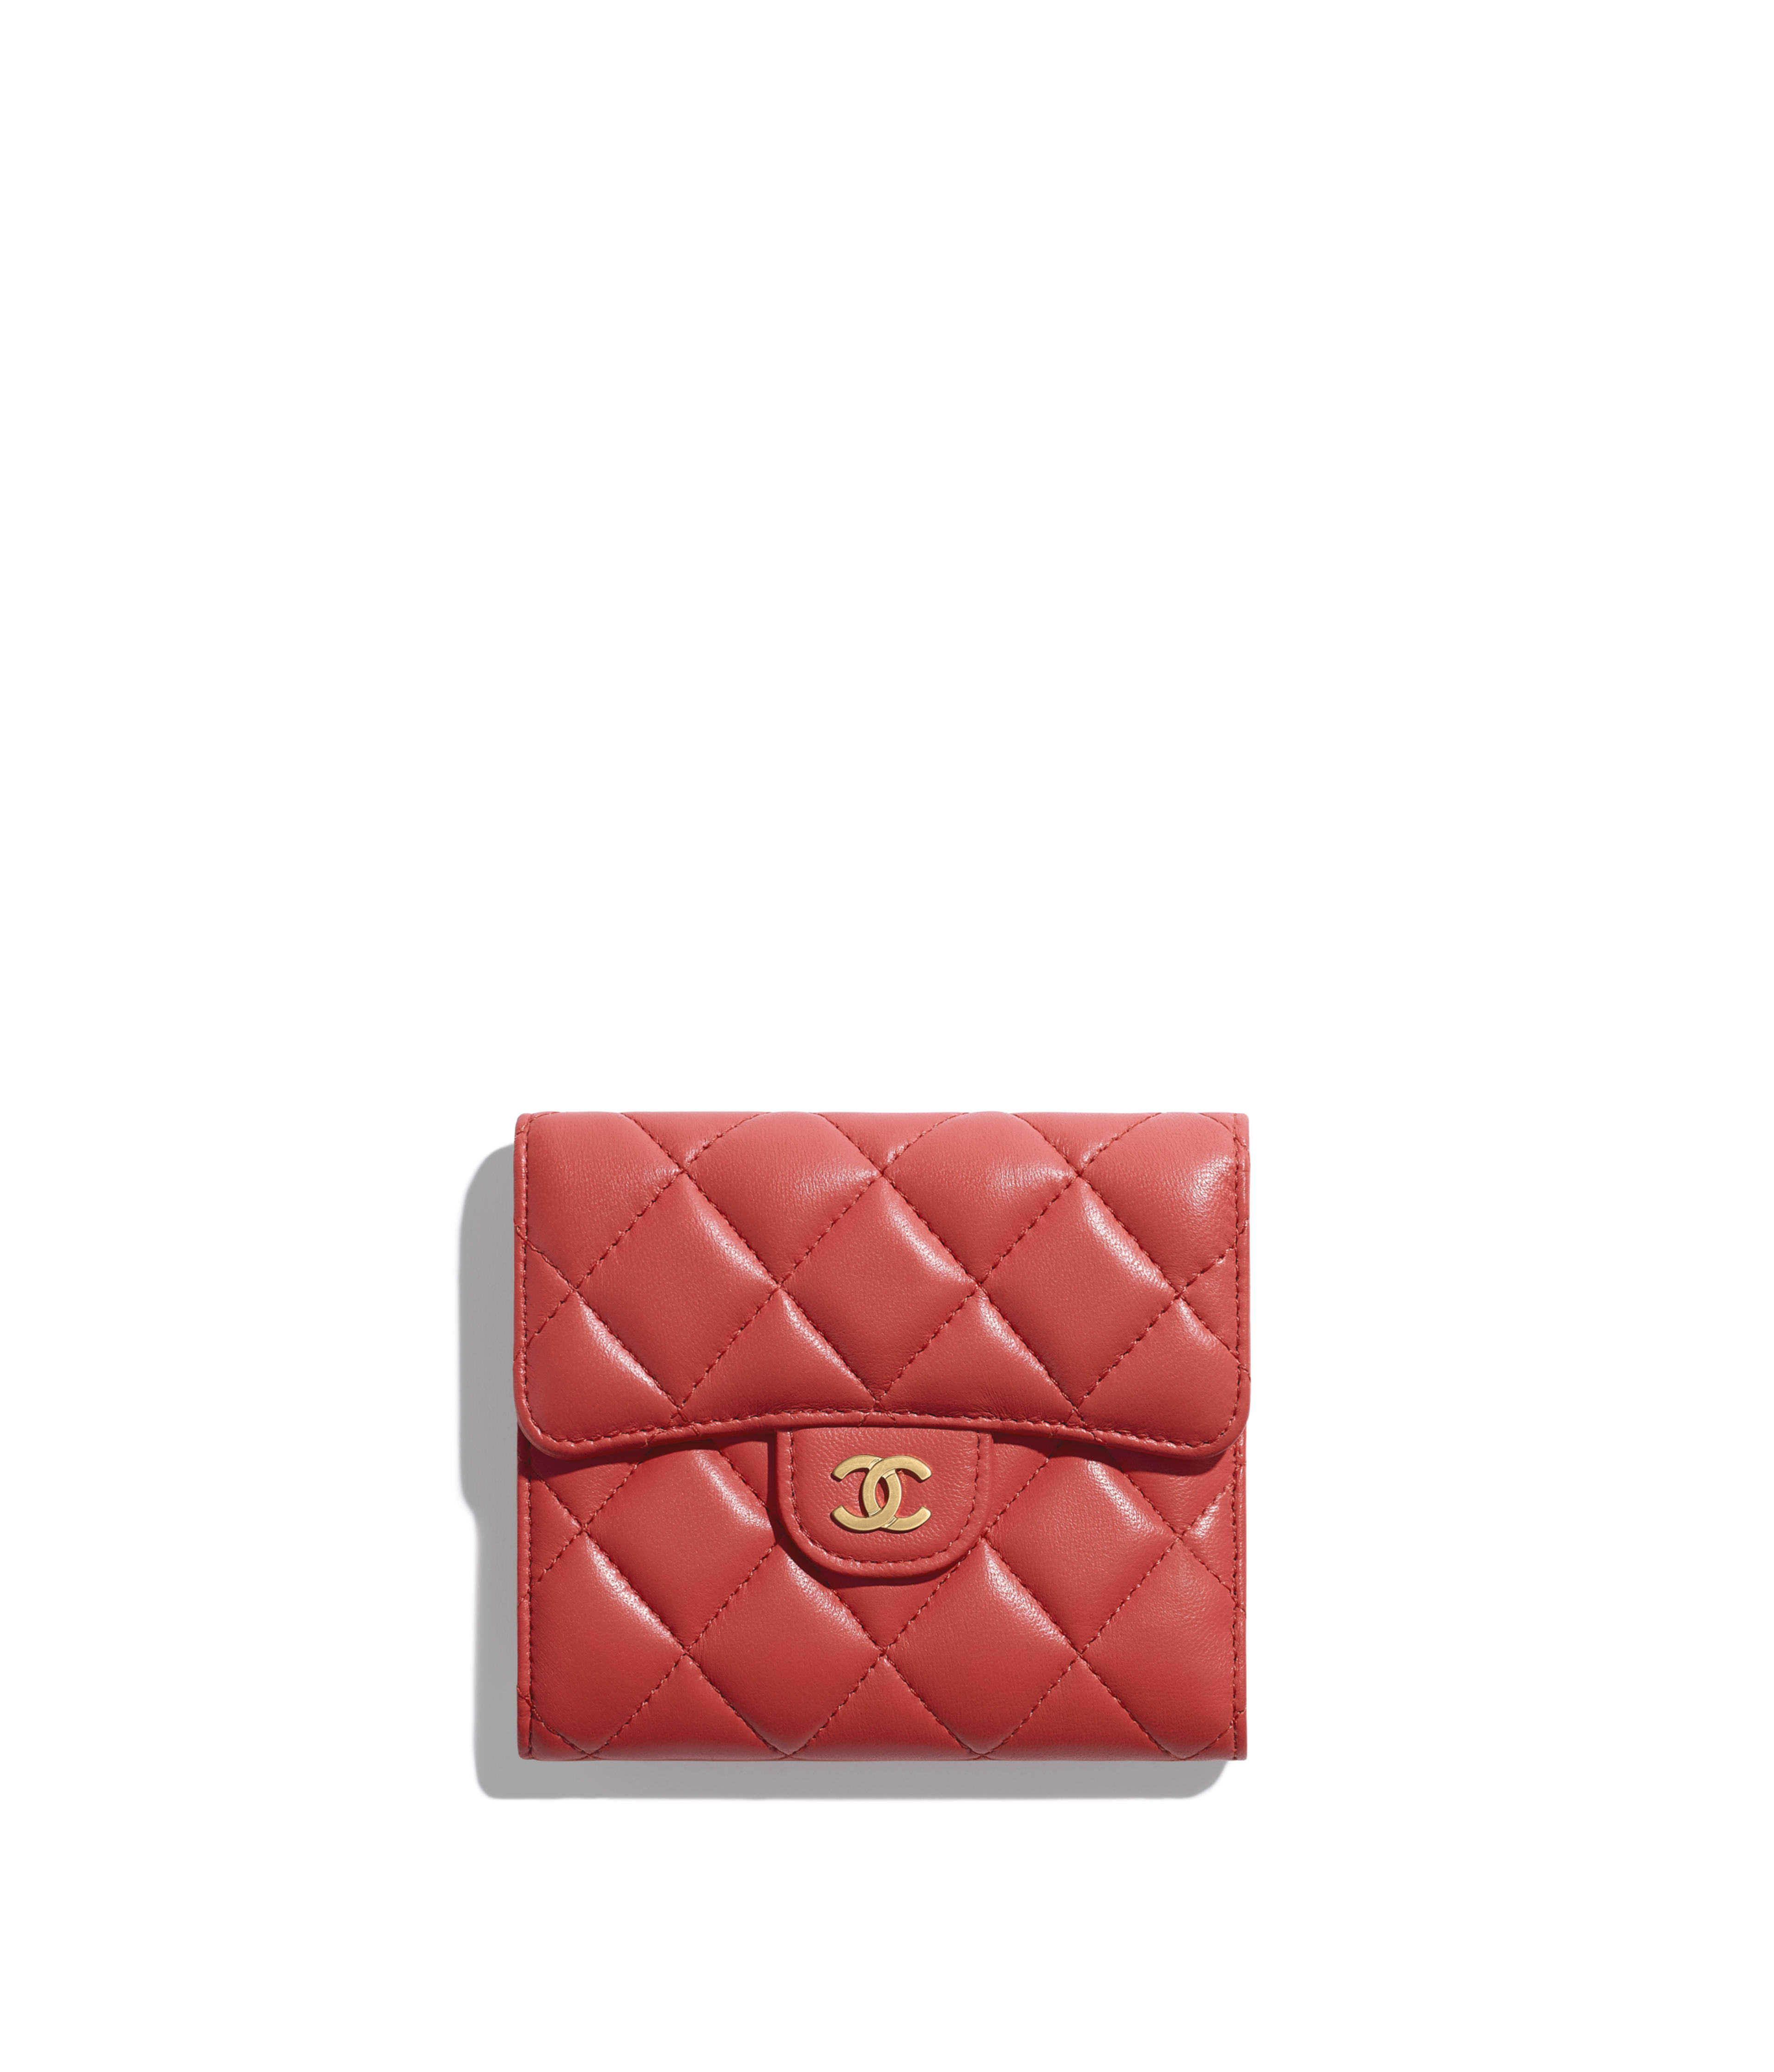 aa638d1fbfd8c9 Classic Small Flap Wallet Lambskin & Gold-Tone Metal, Red Ref.  A82288Y07659N0896